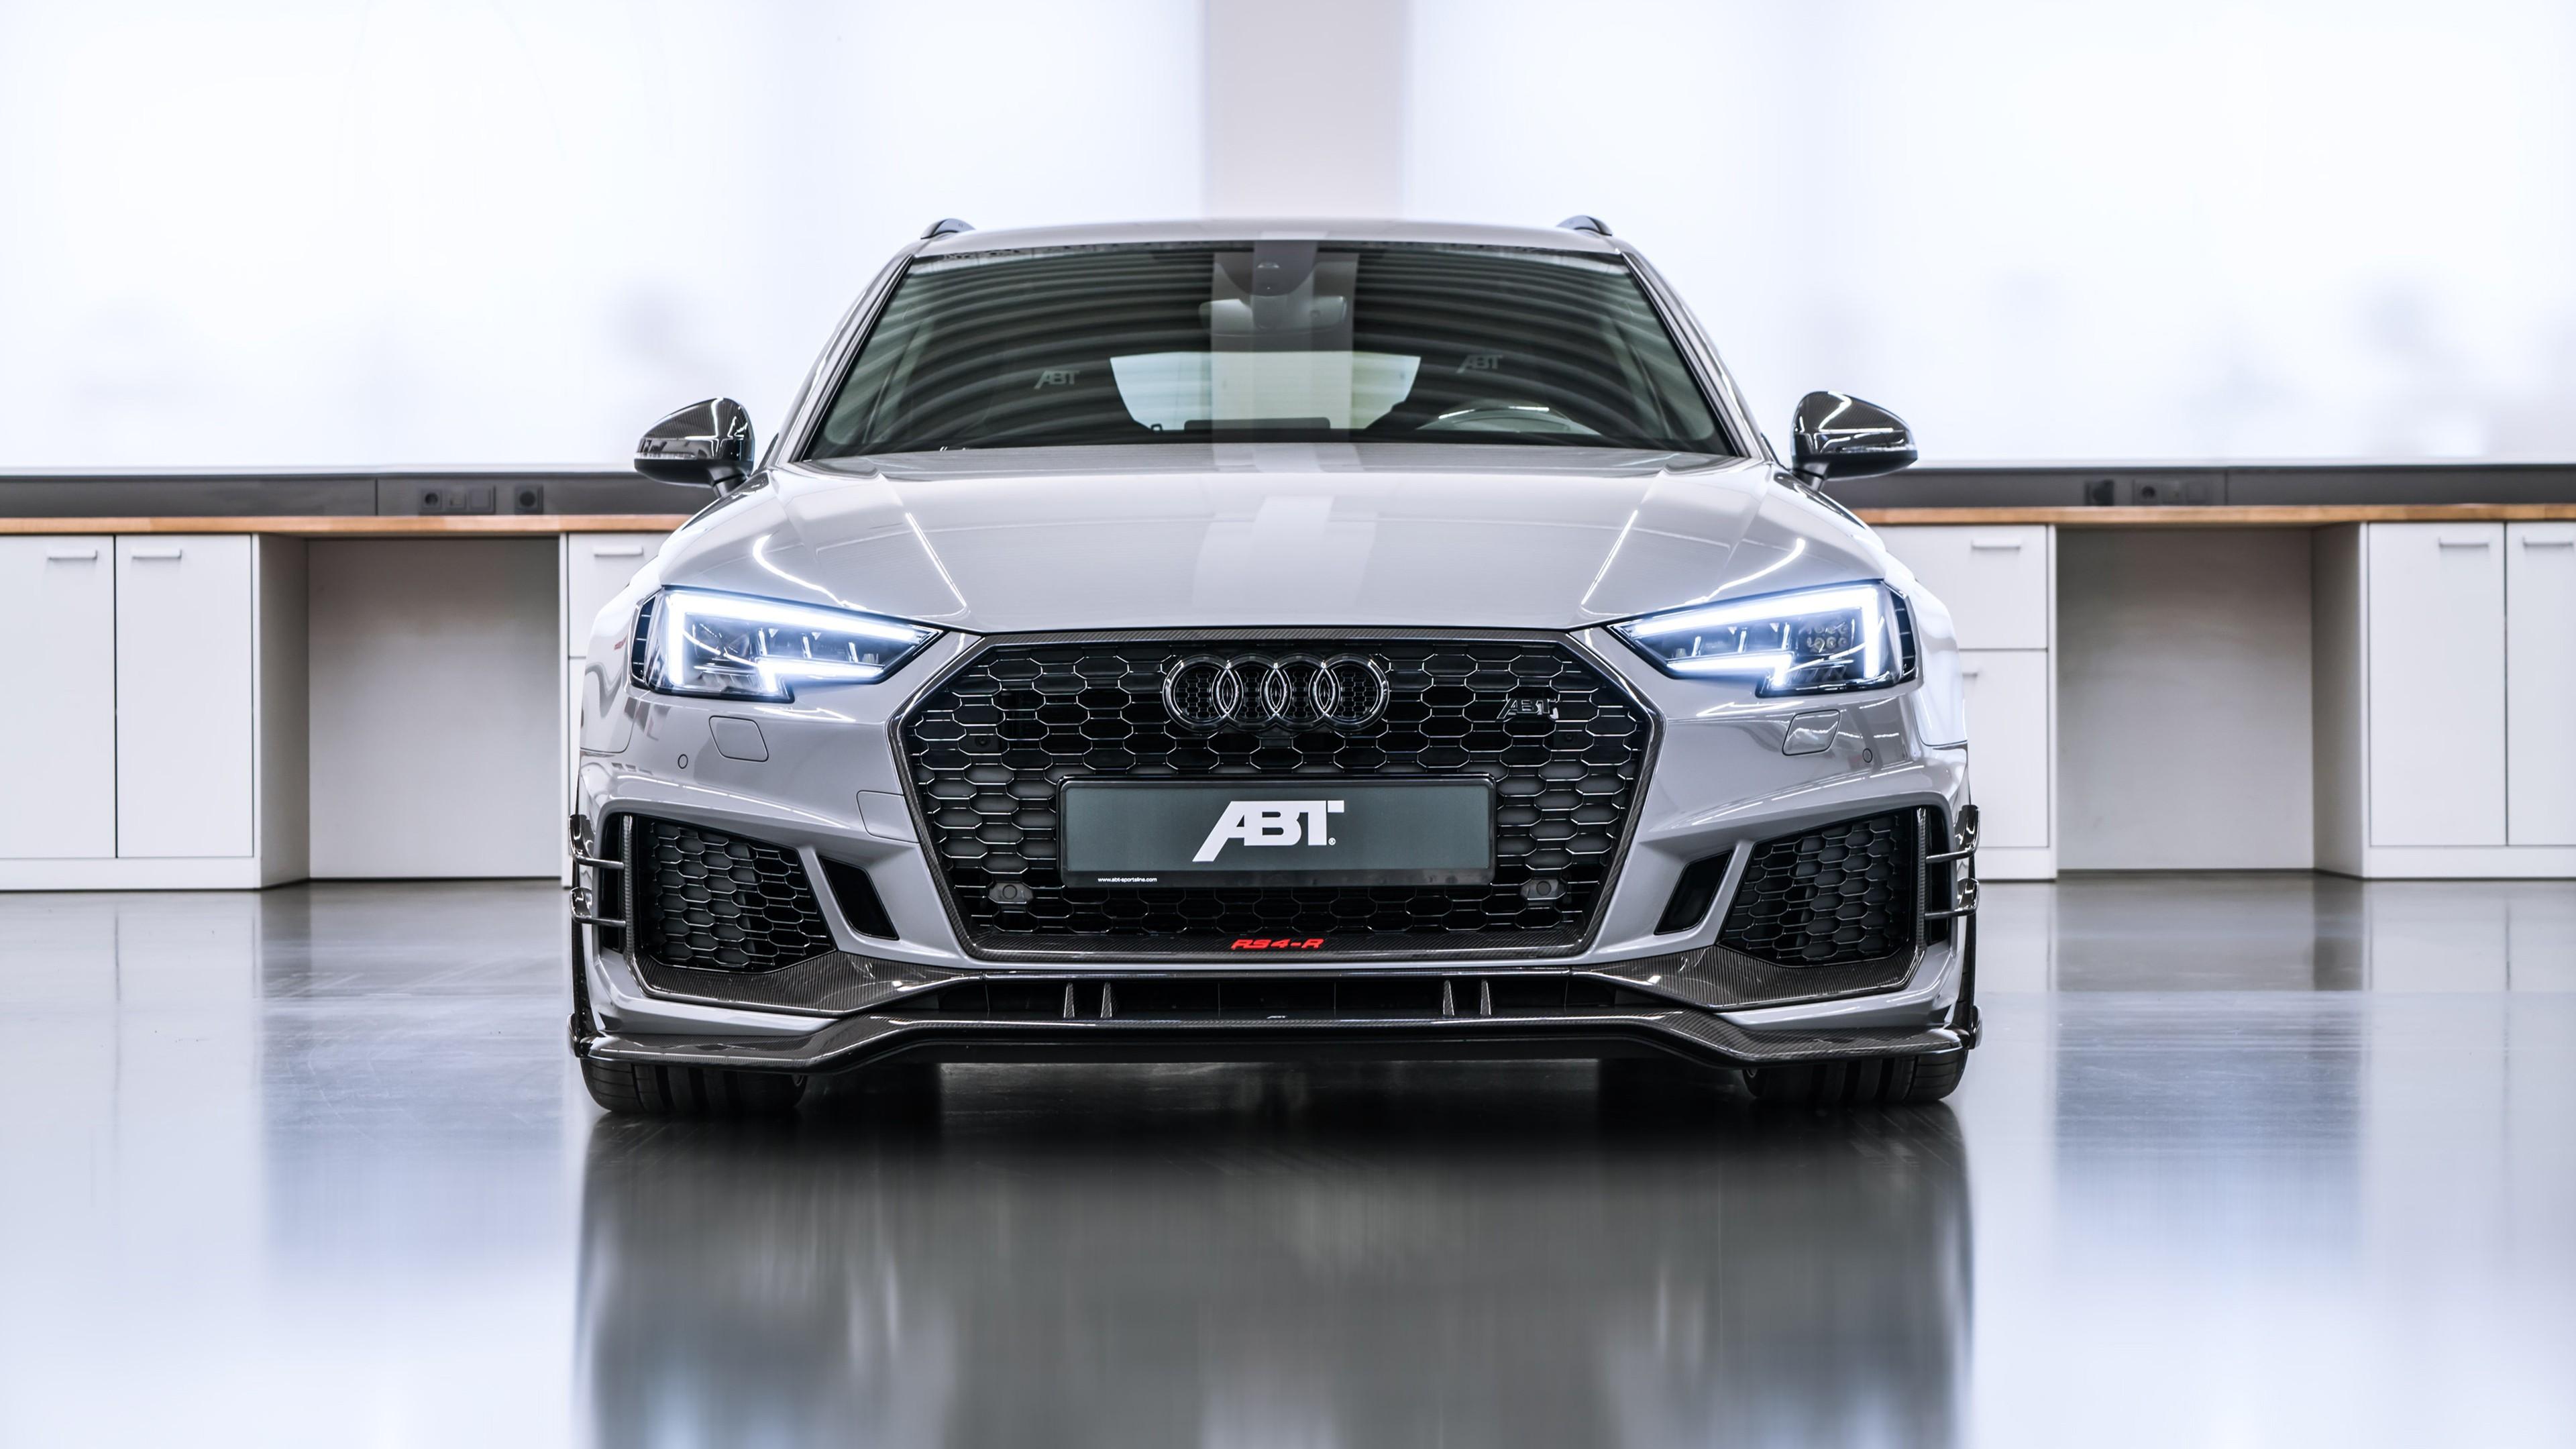 2018 Abt Audi Rs4 R Avant 4k Wallpaper Hd Car Wallpapers Id 9767